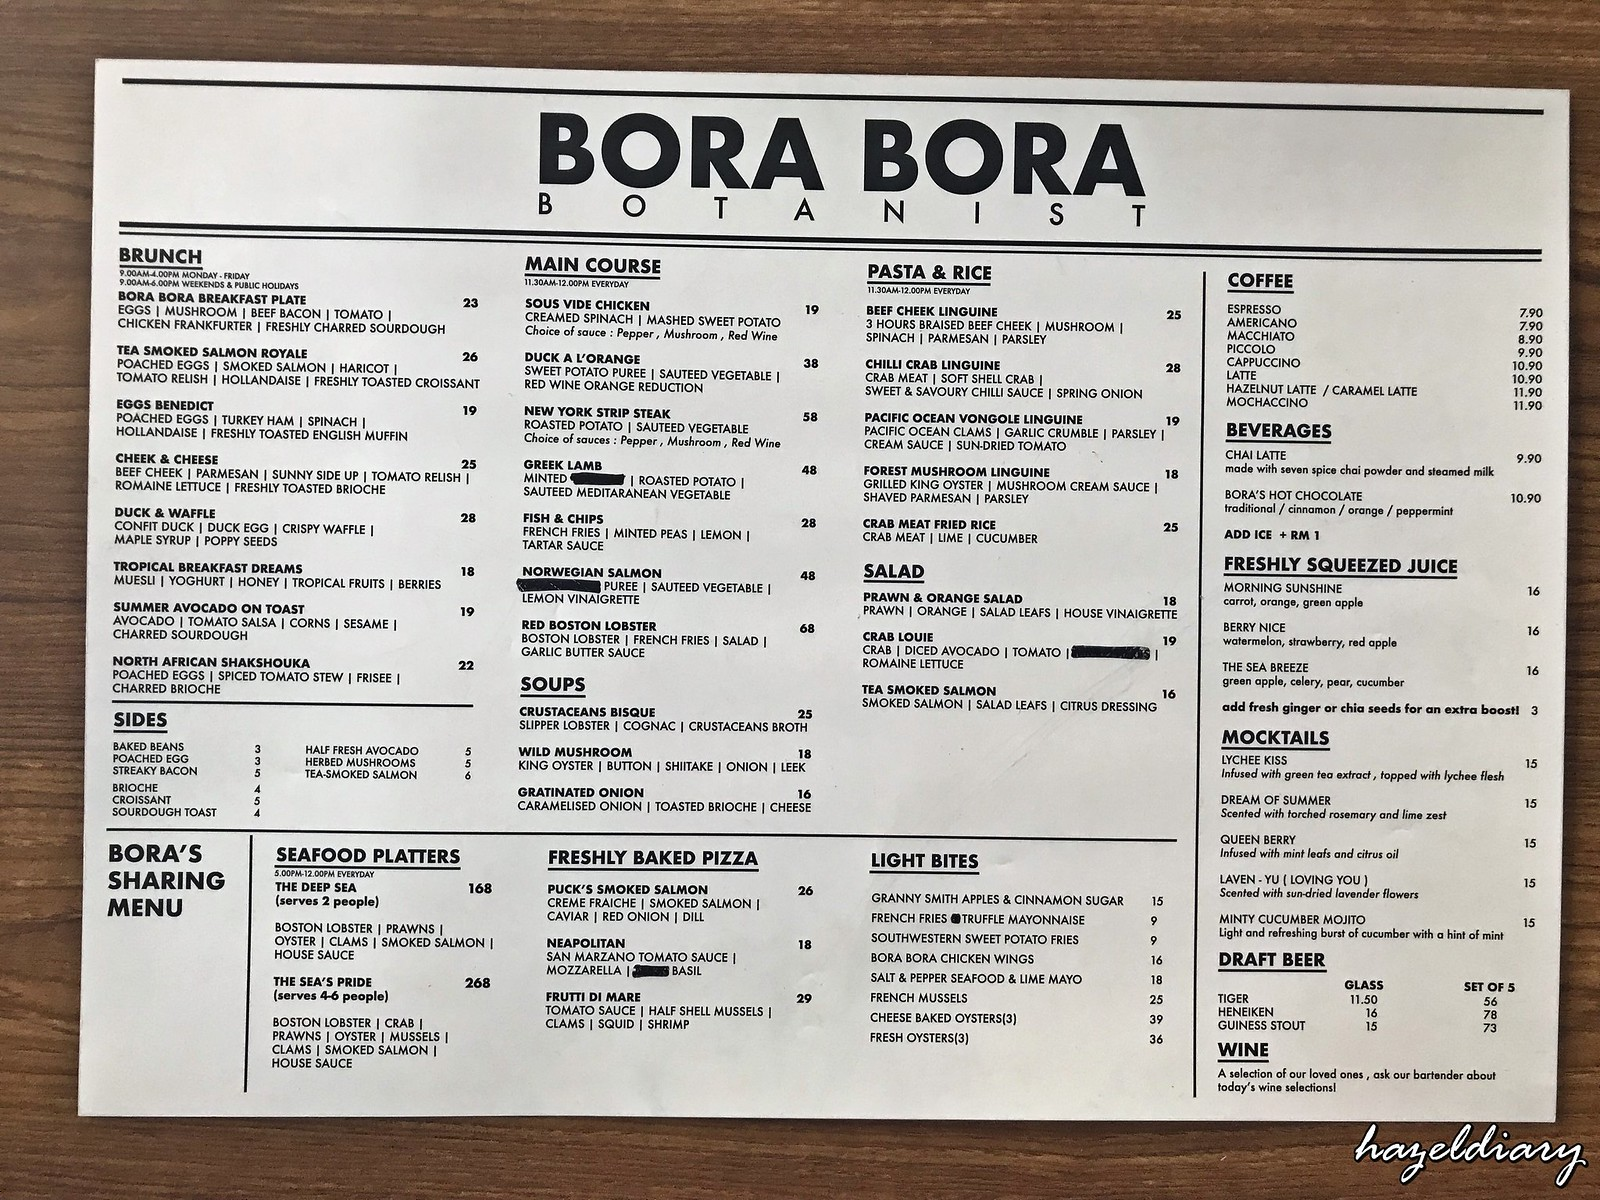 Bora Bora Botanist-Senibong Cove-Menu